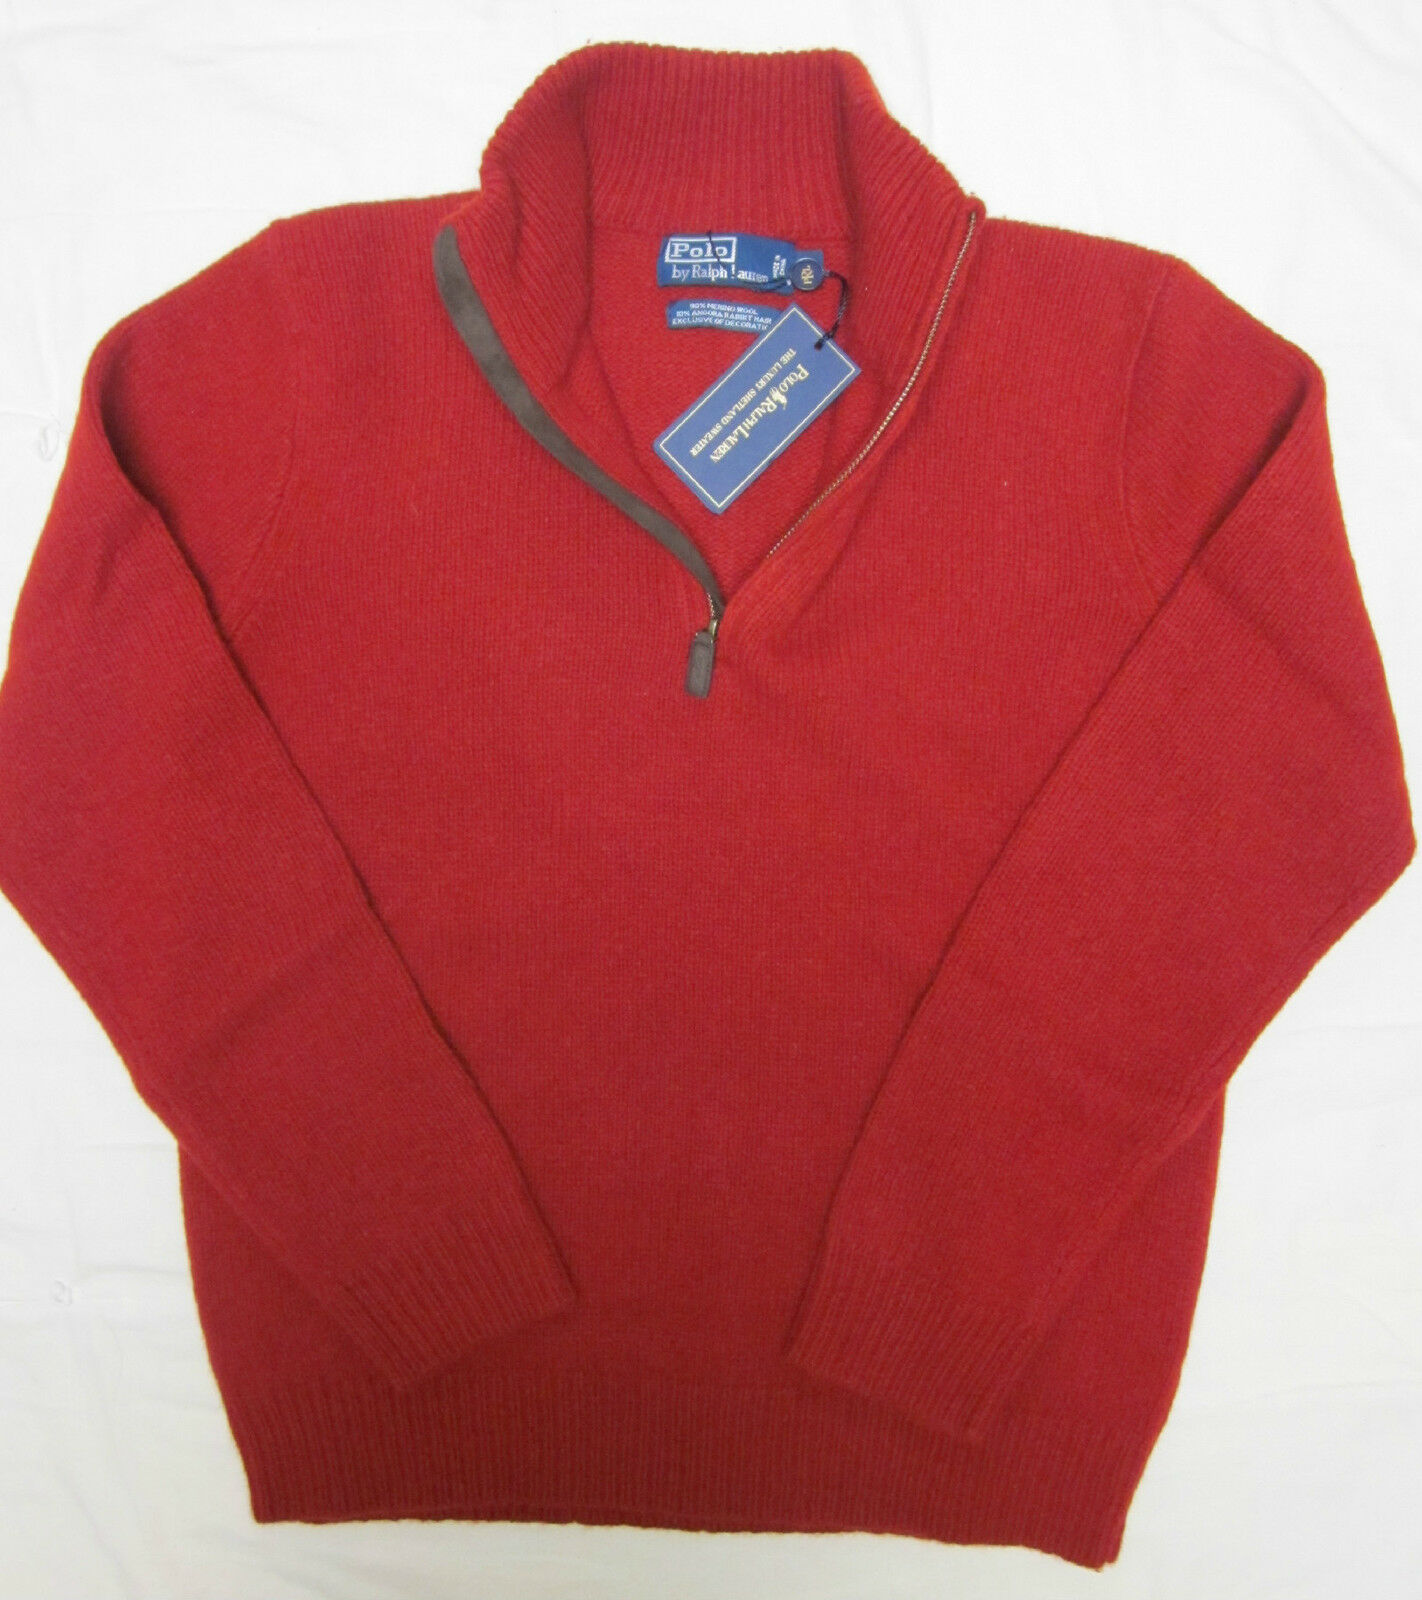 NWT polo Ralph Lauren 1/2 zip angora merino wool sweater suede decoration S